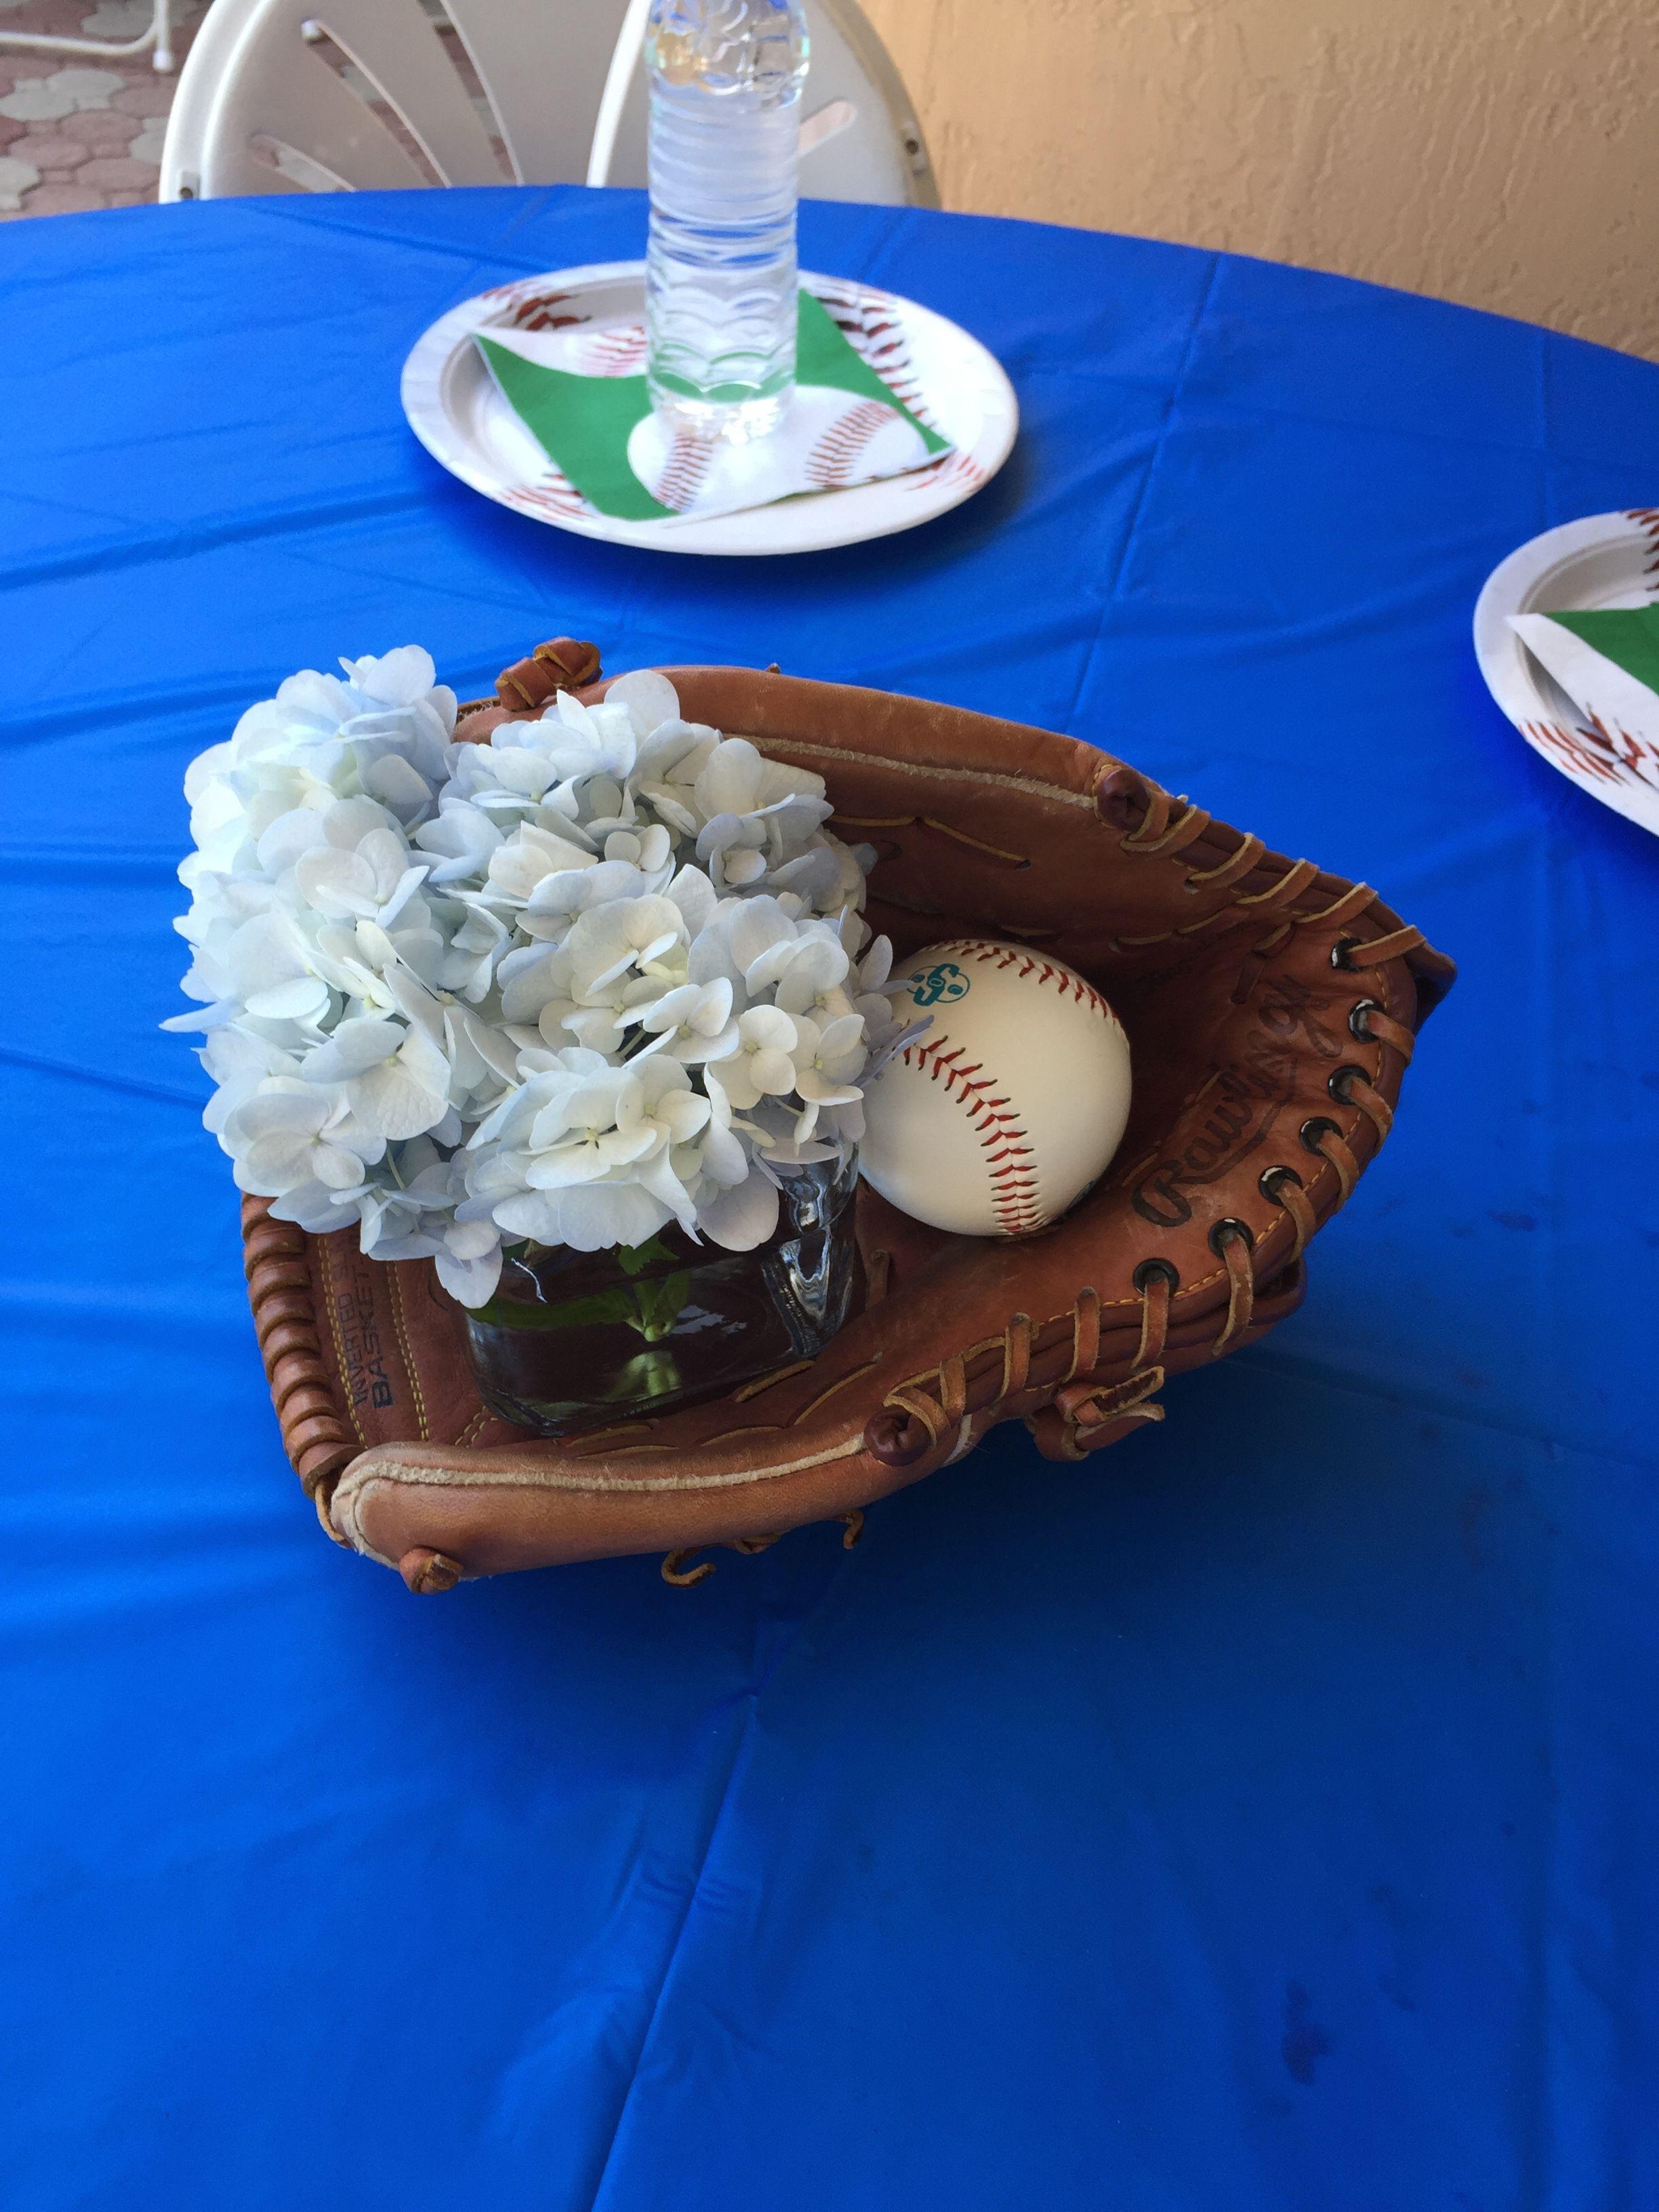 Baseball baby shower centerpieces glove baseball flowers home